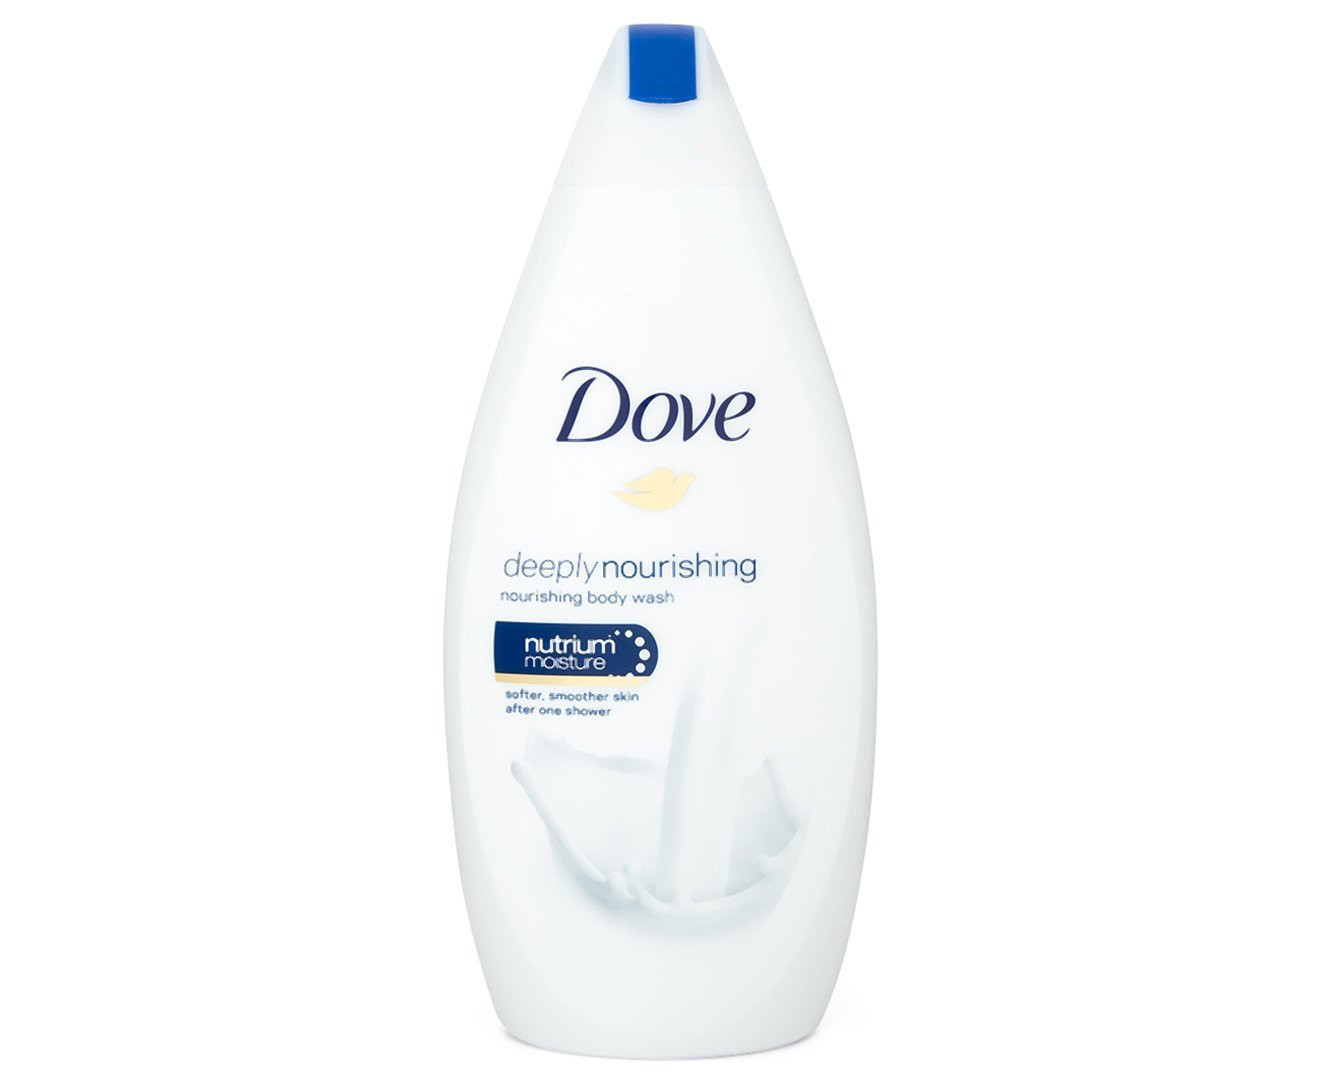 Dove Deeply Nourishing Body Wash 500ml